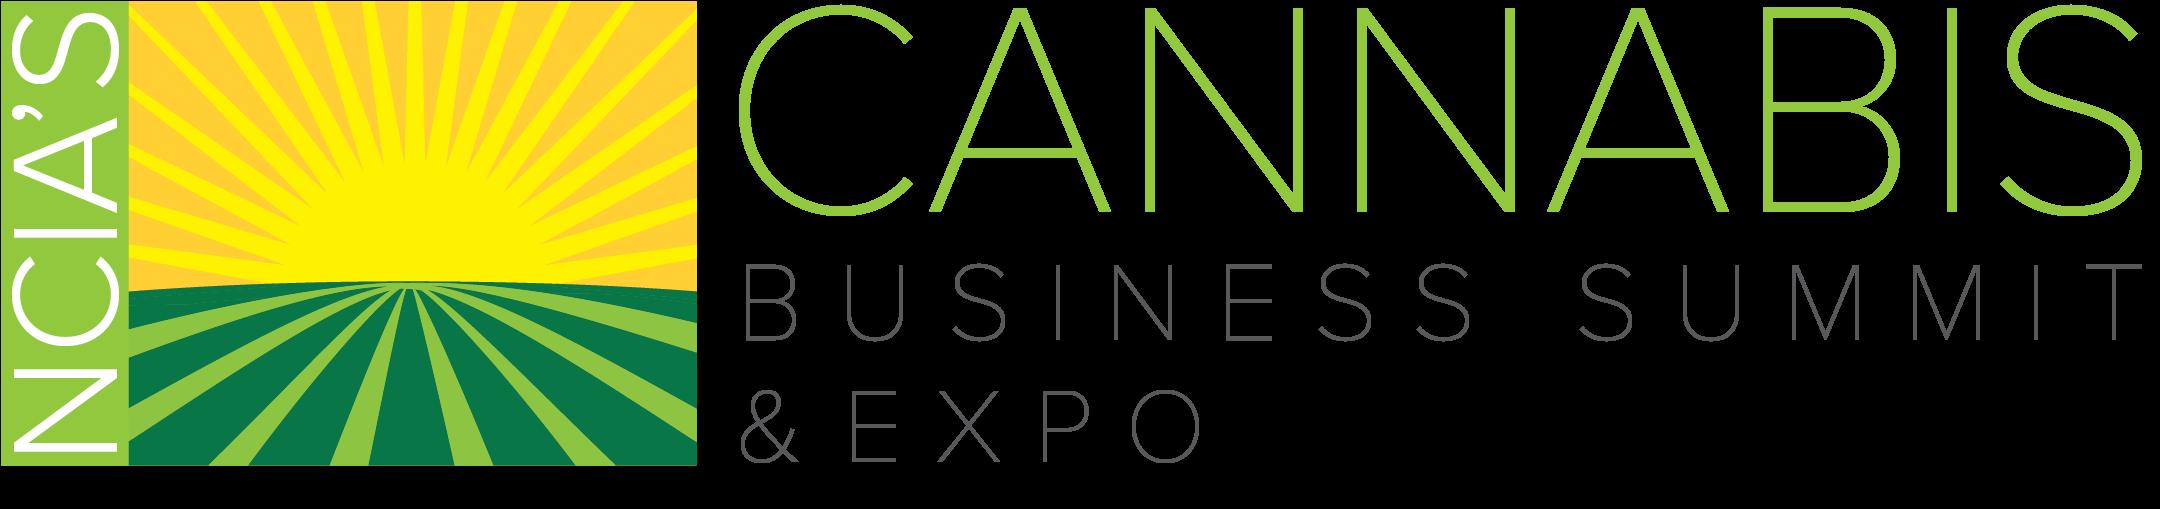 NCIA's Cannabis Business Summit & Expo | Plano, United States